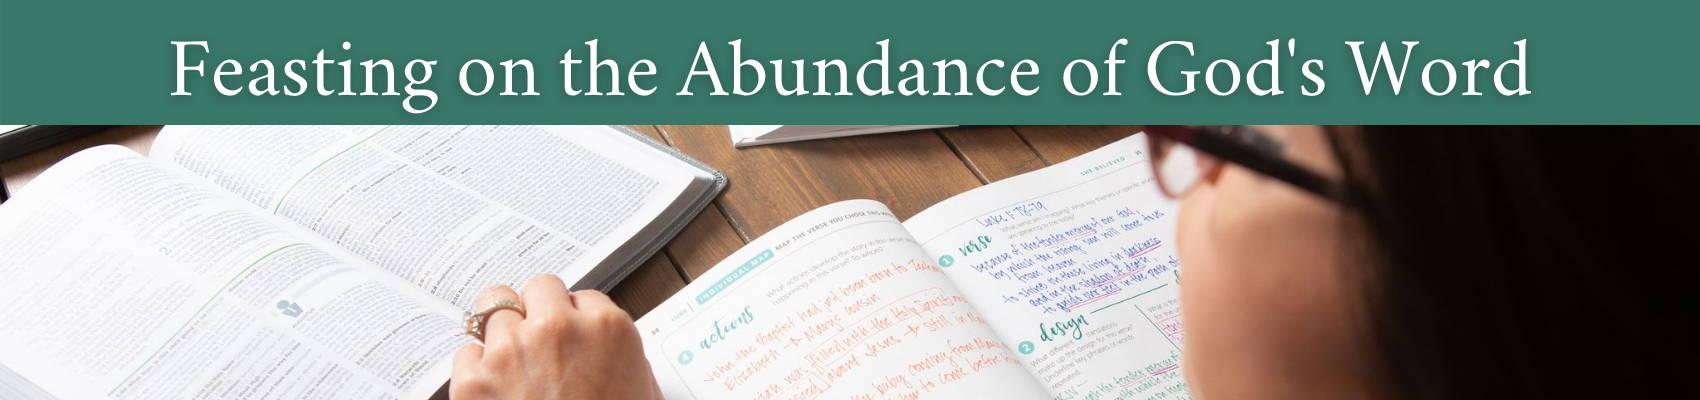 Feasting on the Abundance of God's Word